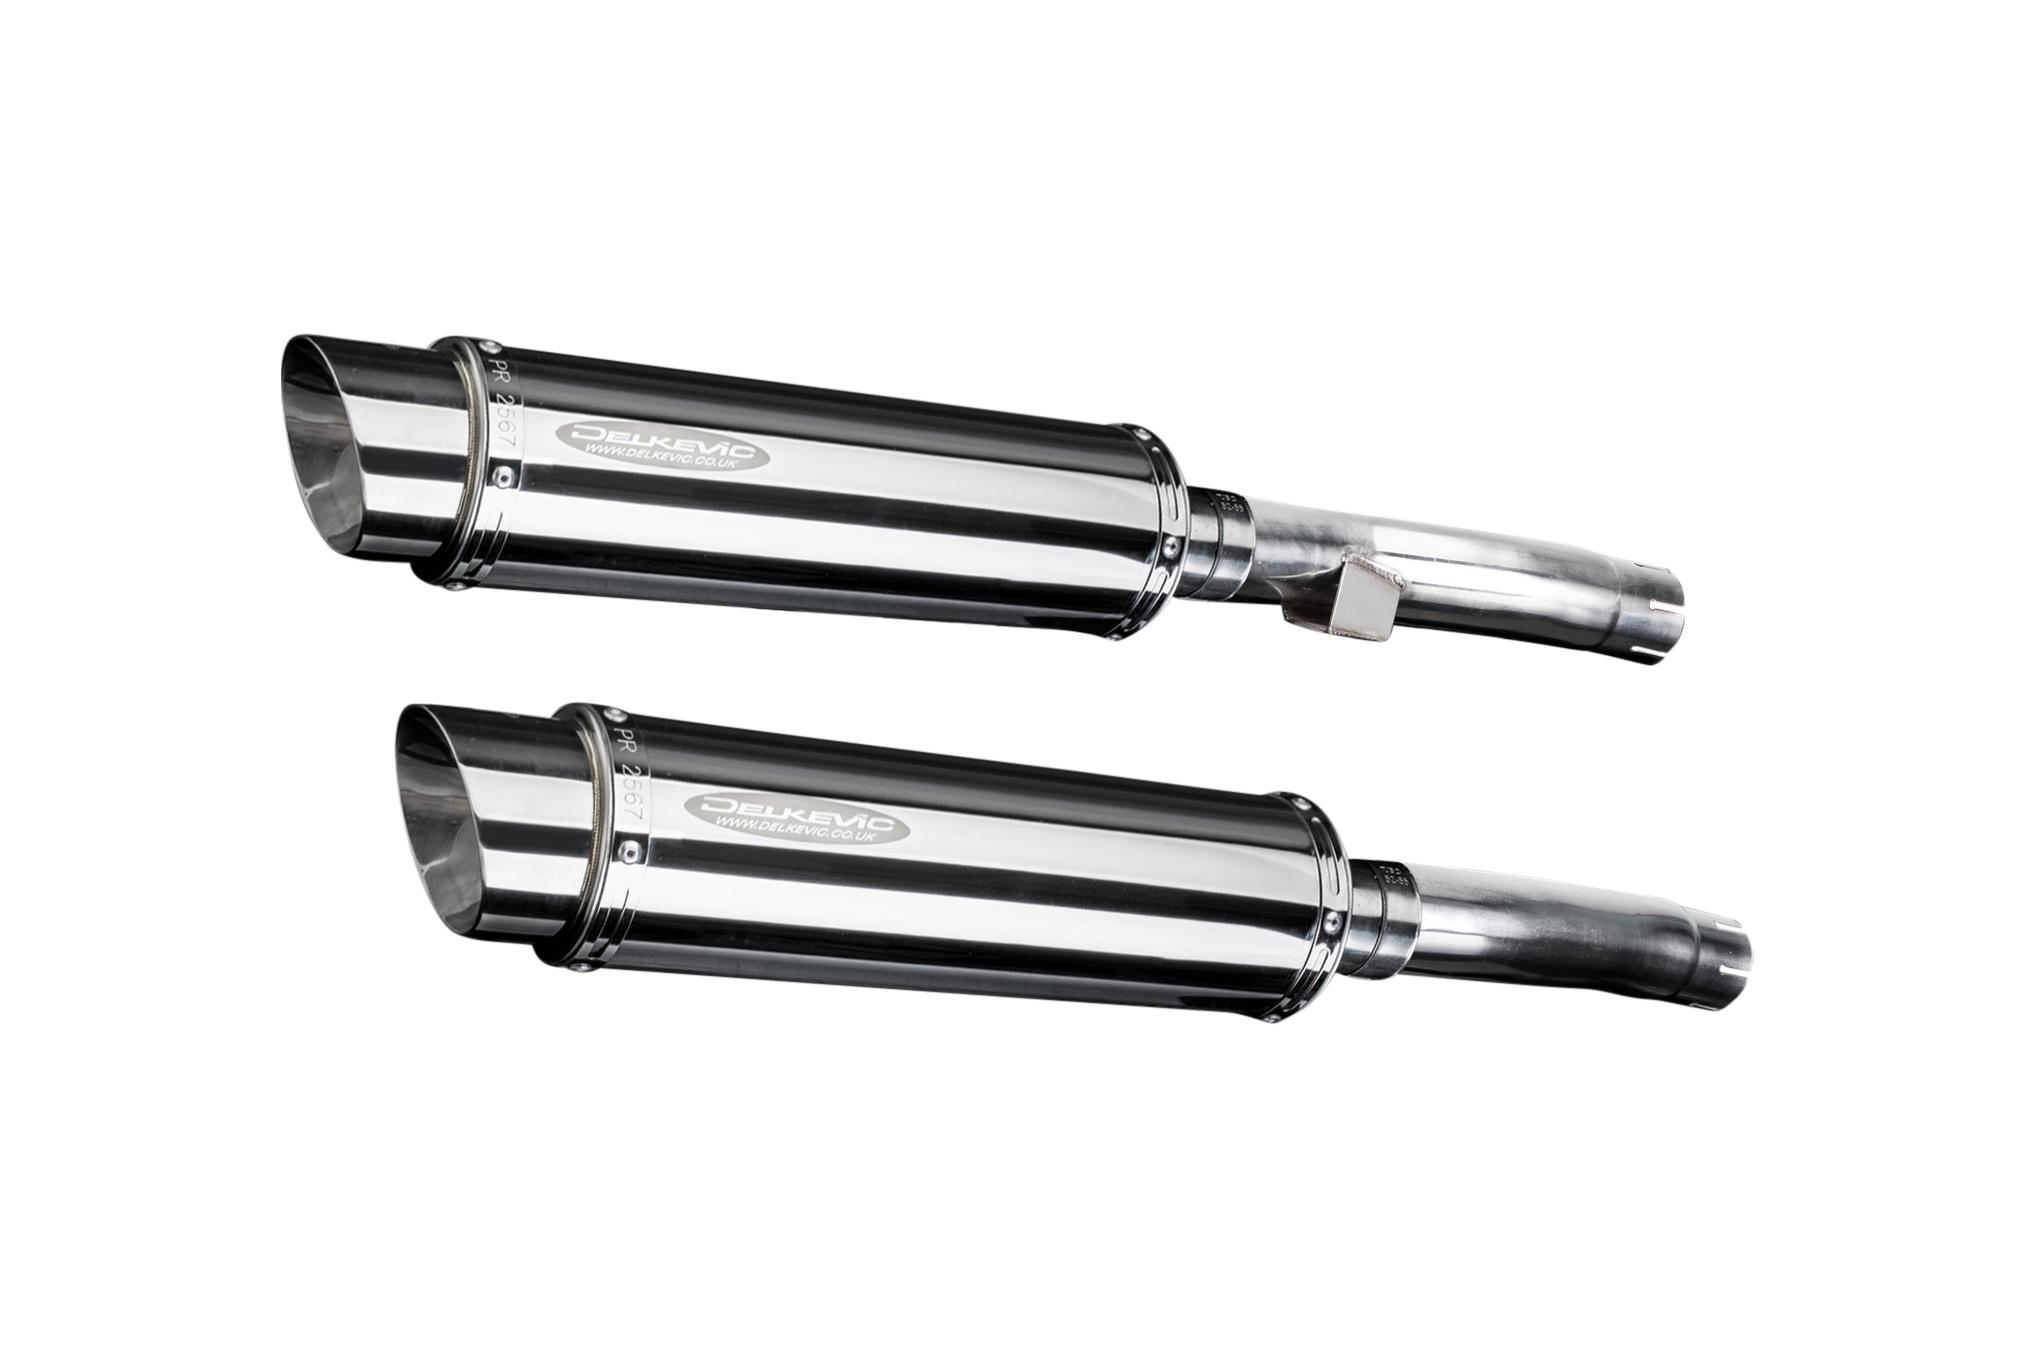 Kawasaki Zr Zephyr 92 95 14 Stainless Steel Mufflers